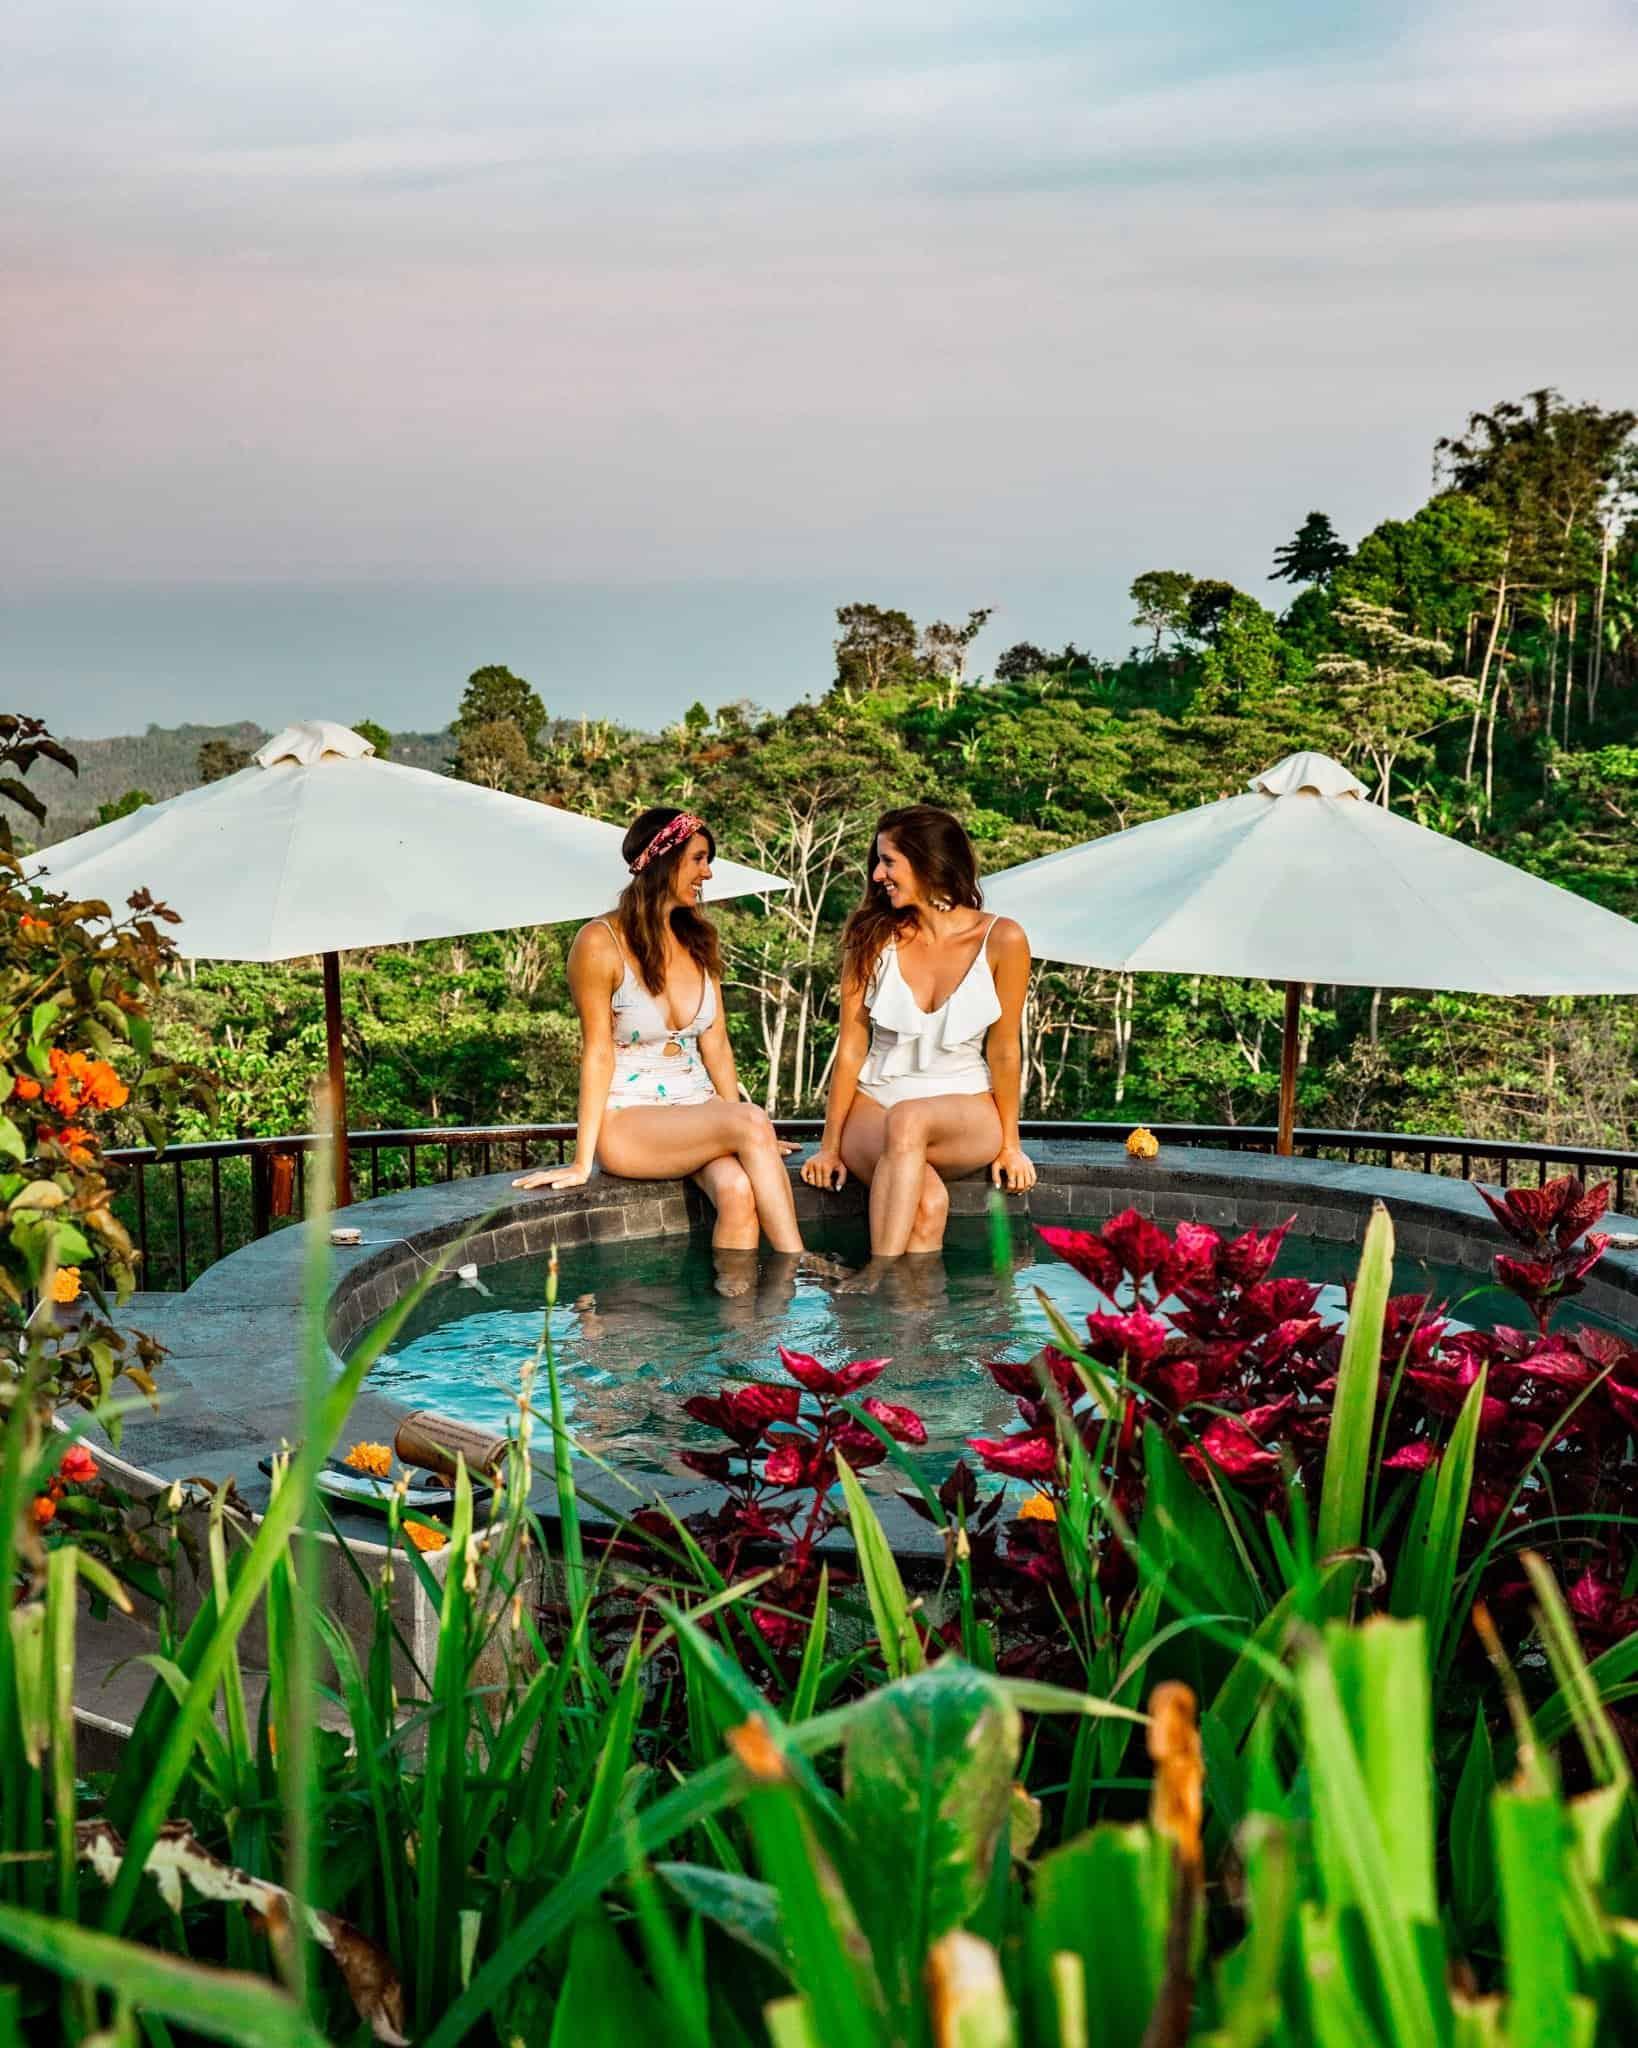 Jacuzzi at Munduk Moding Plantation Bali - The Next Trip